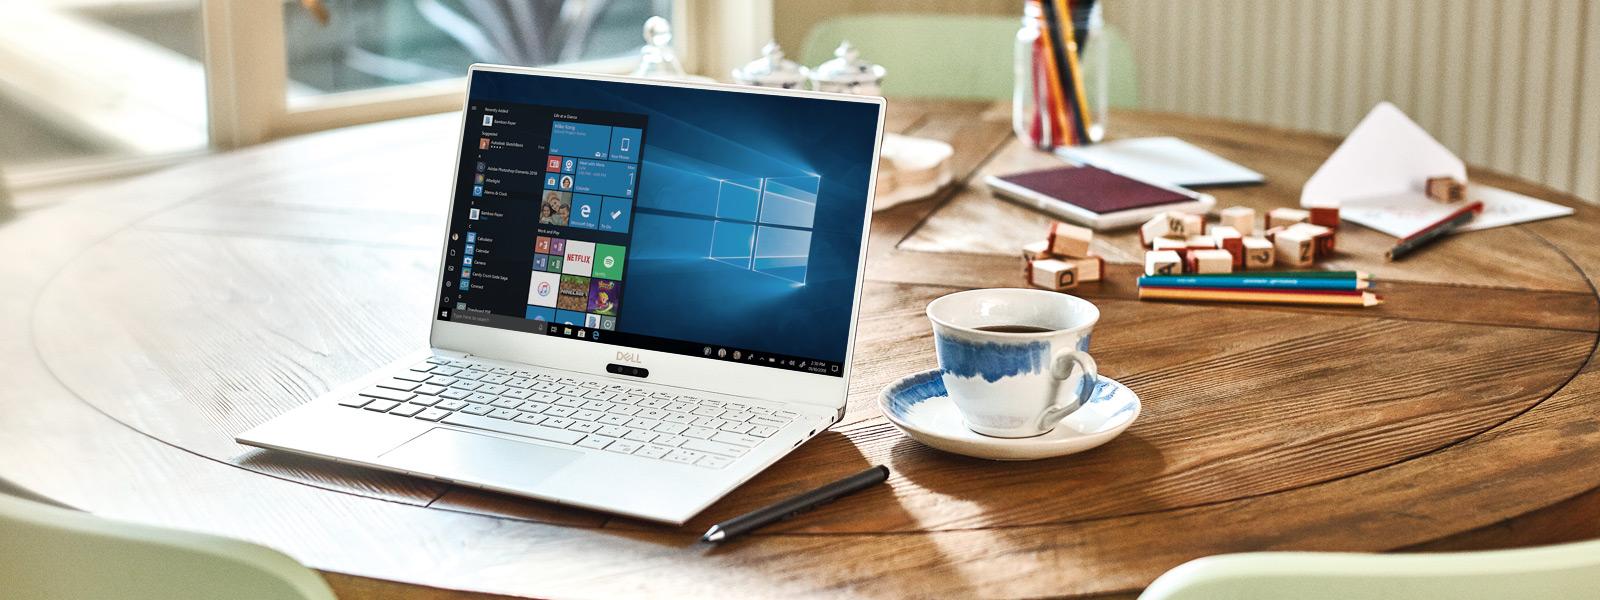 Dell XPS 13 9370 otvoren na stolu sa Windows 10 početnim ekranom.